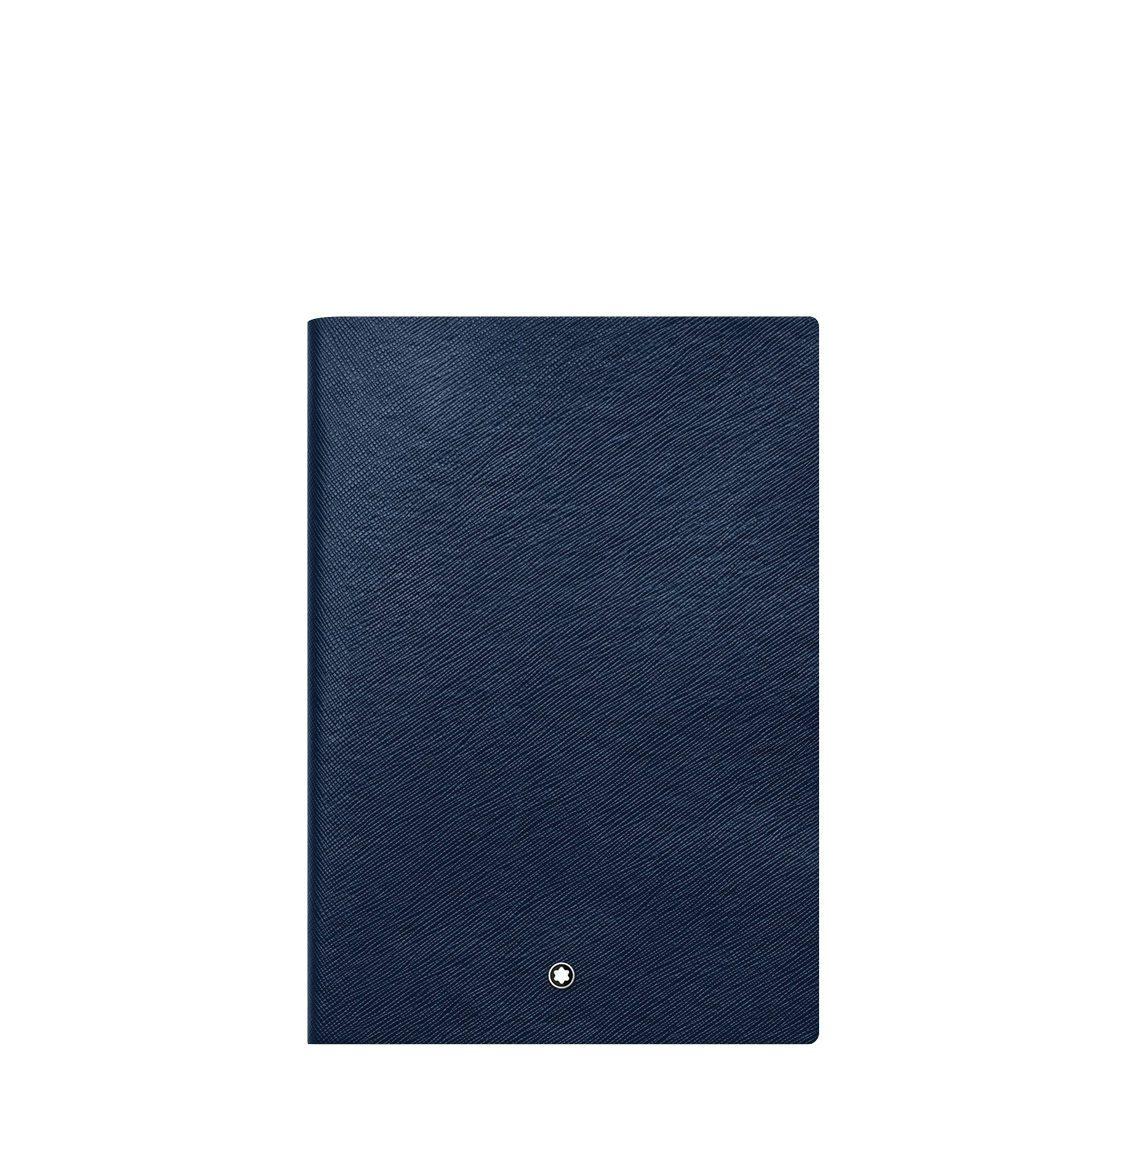 Montblanc Fine Stationery Notebook Indigo Lined